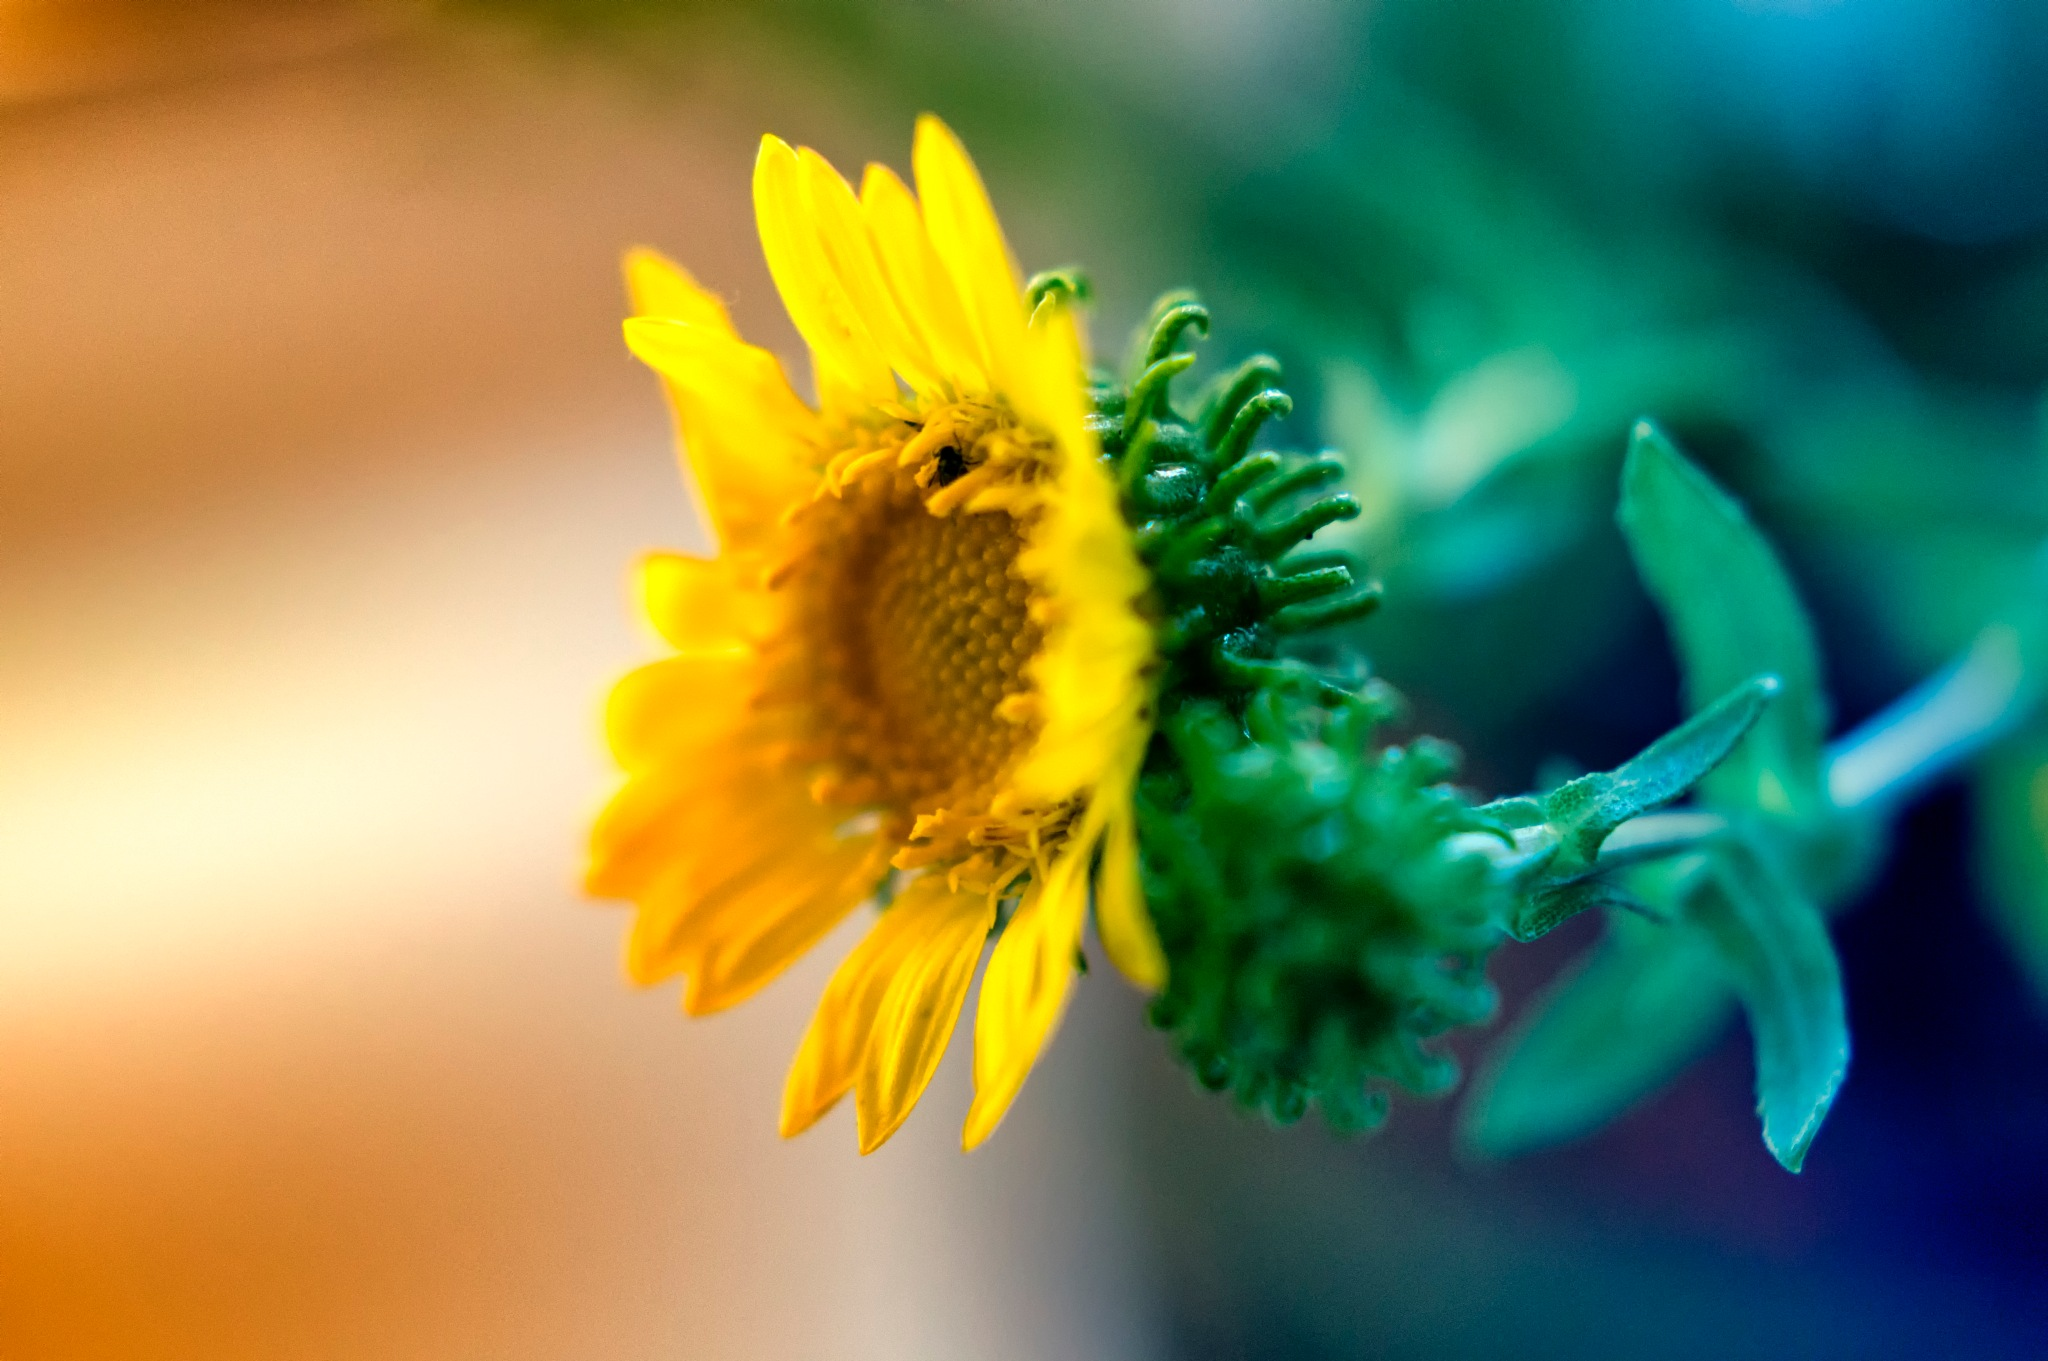 ~ Flower ~ by Michael Krivoshey